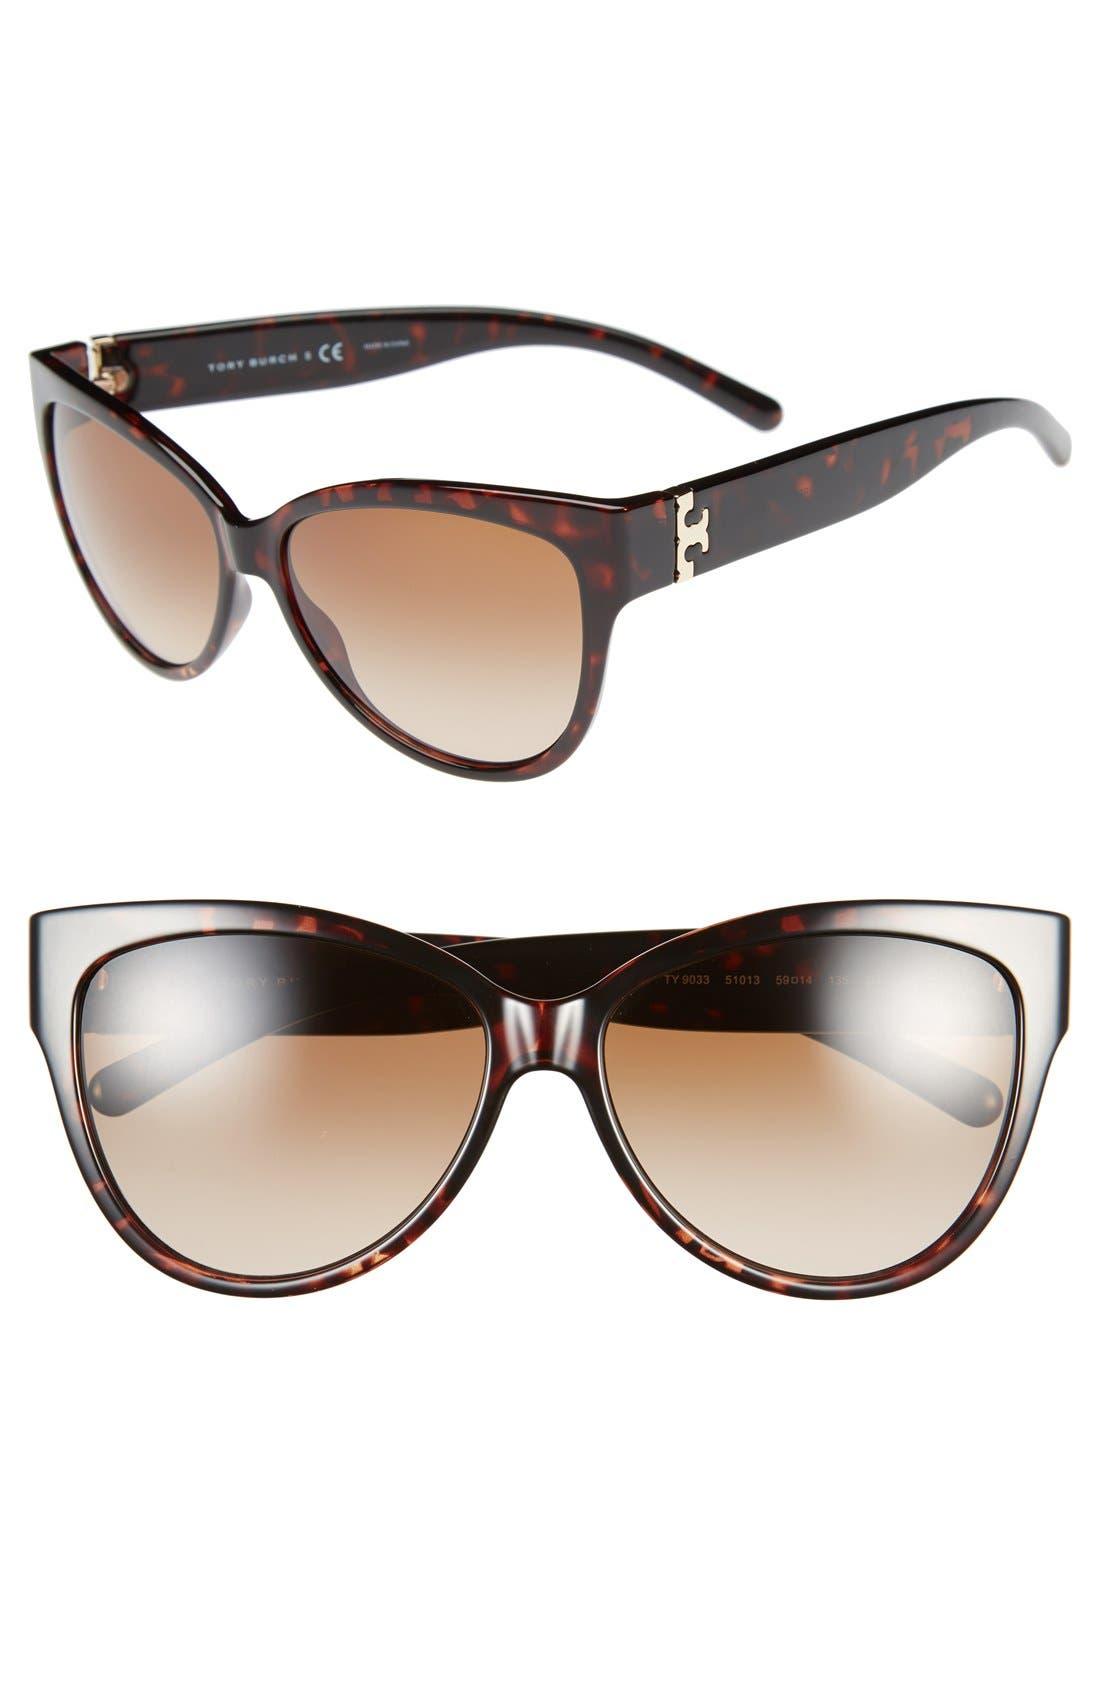 59mm Cat Eye Sunglasses,                             Main thumbnail 1, color,                             Tortoise